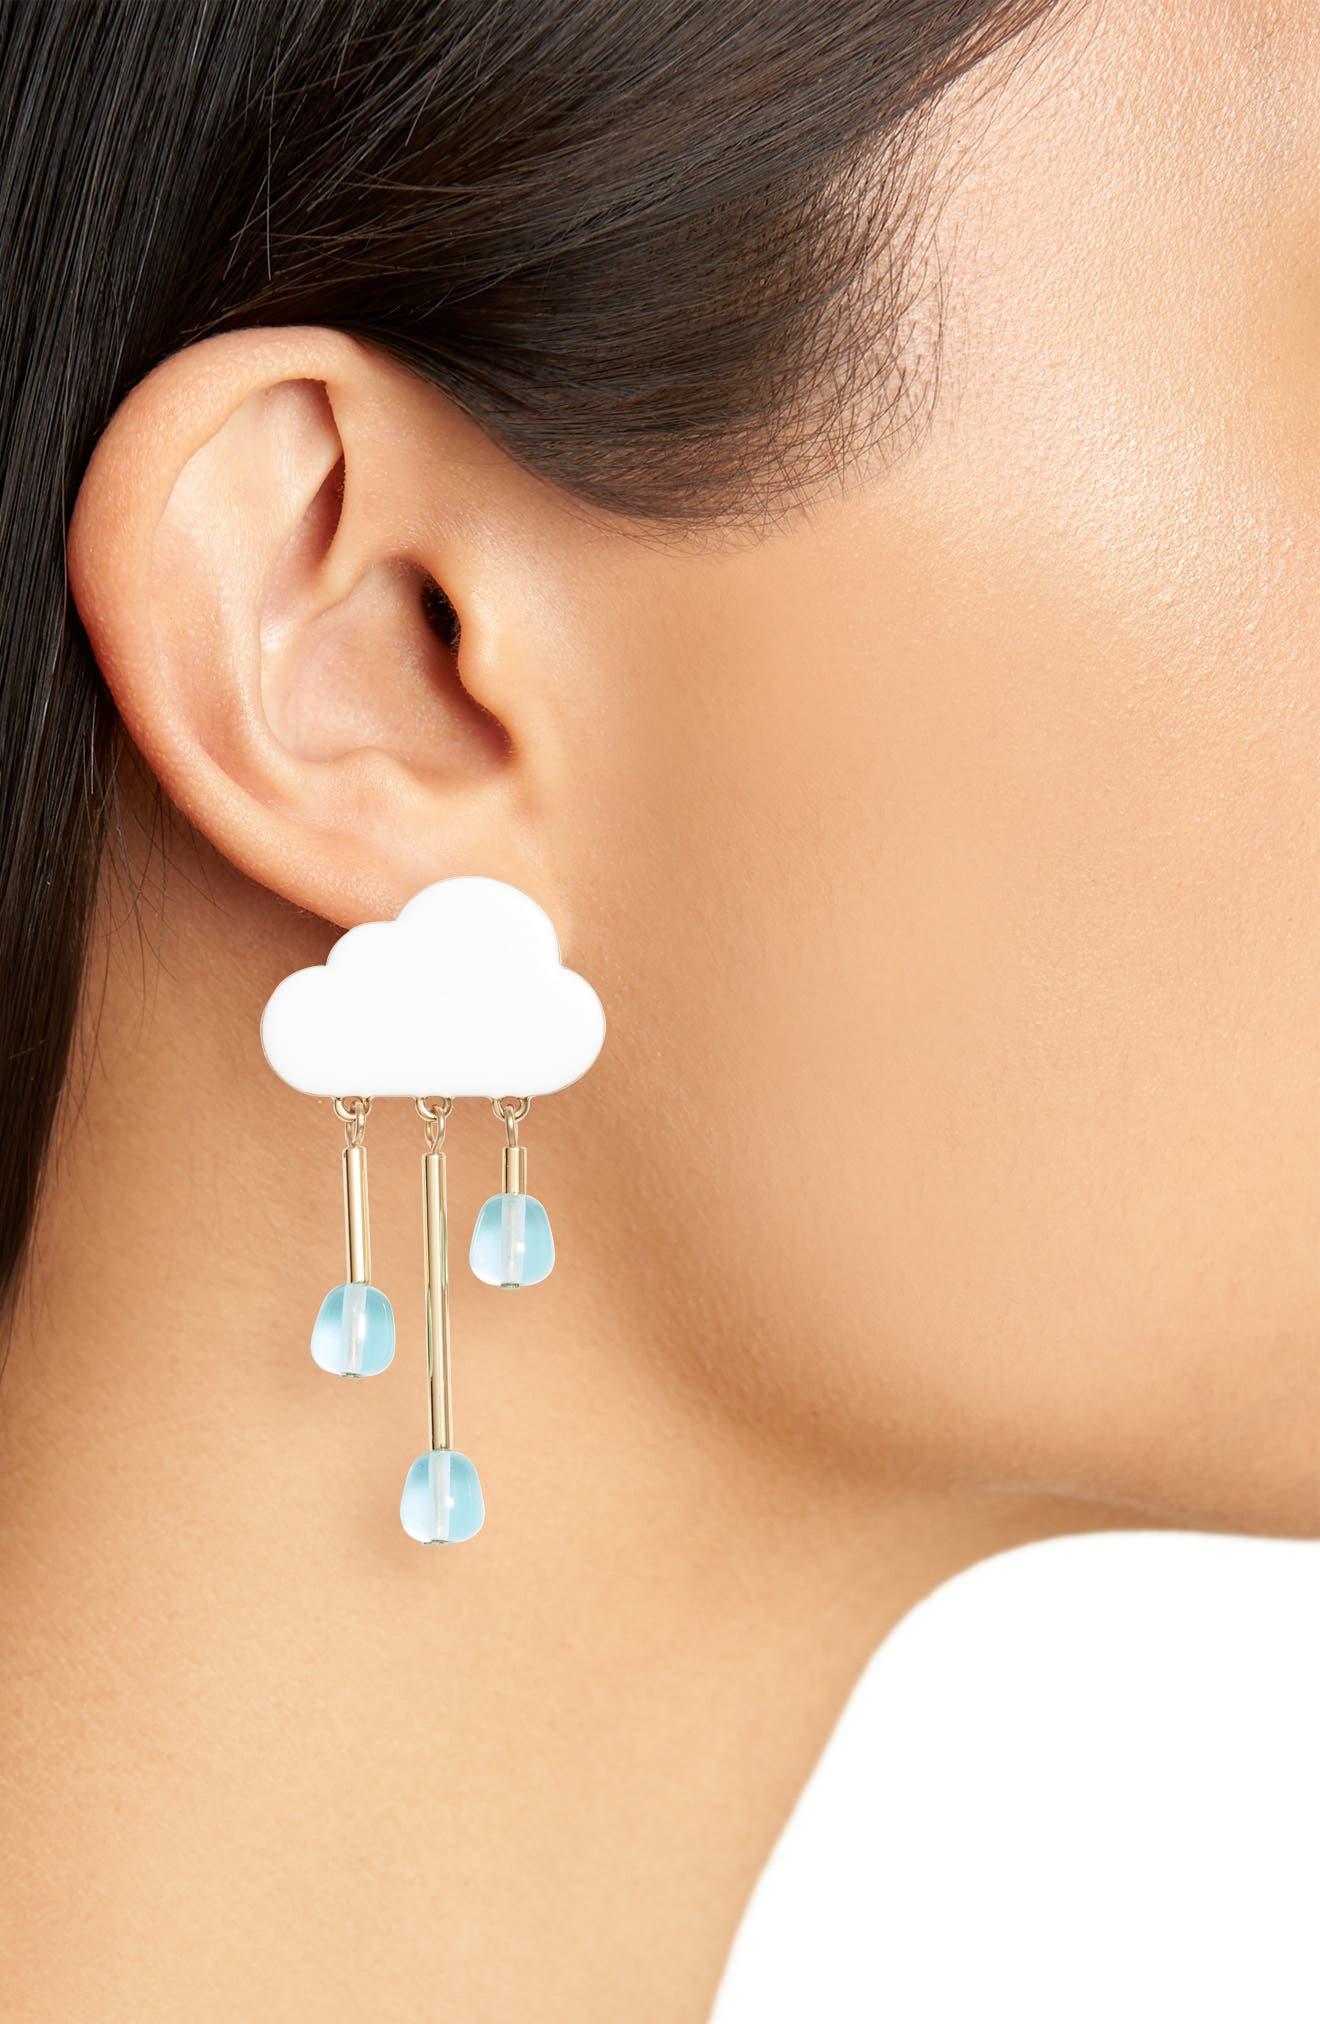 Chance of Rain Drop Earrings,                             Alternate thumbnail 2, color,                             100